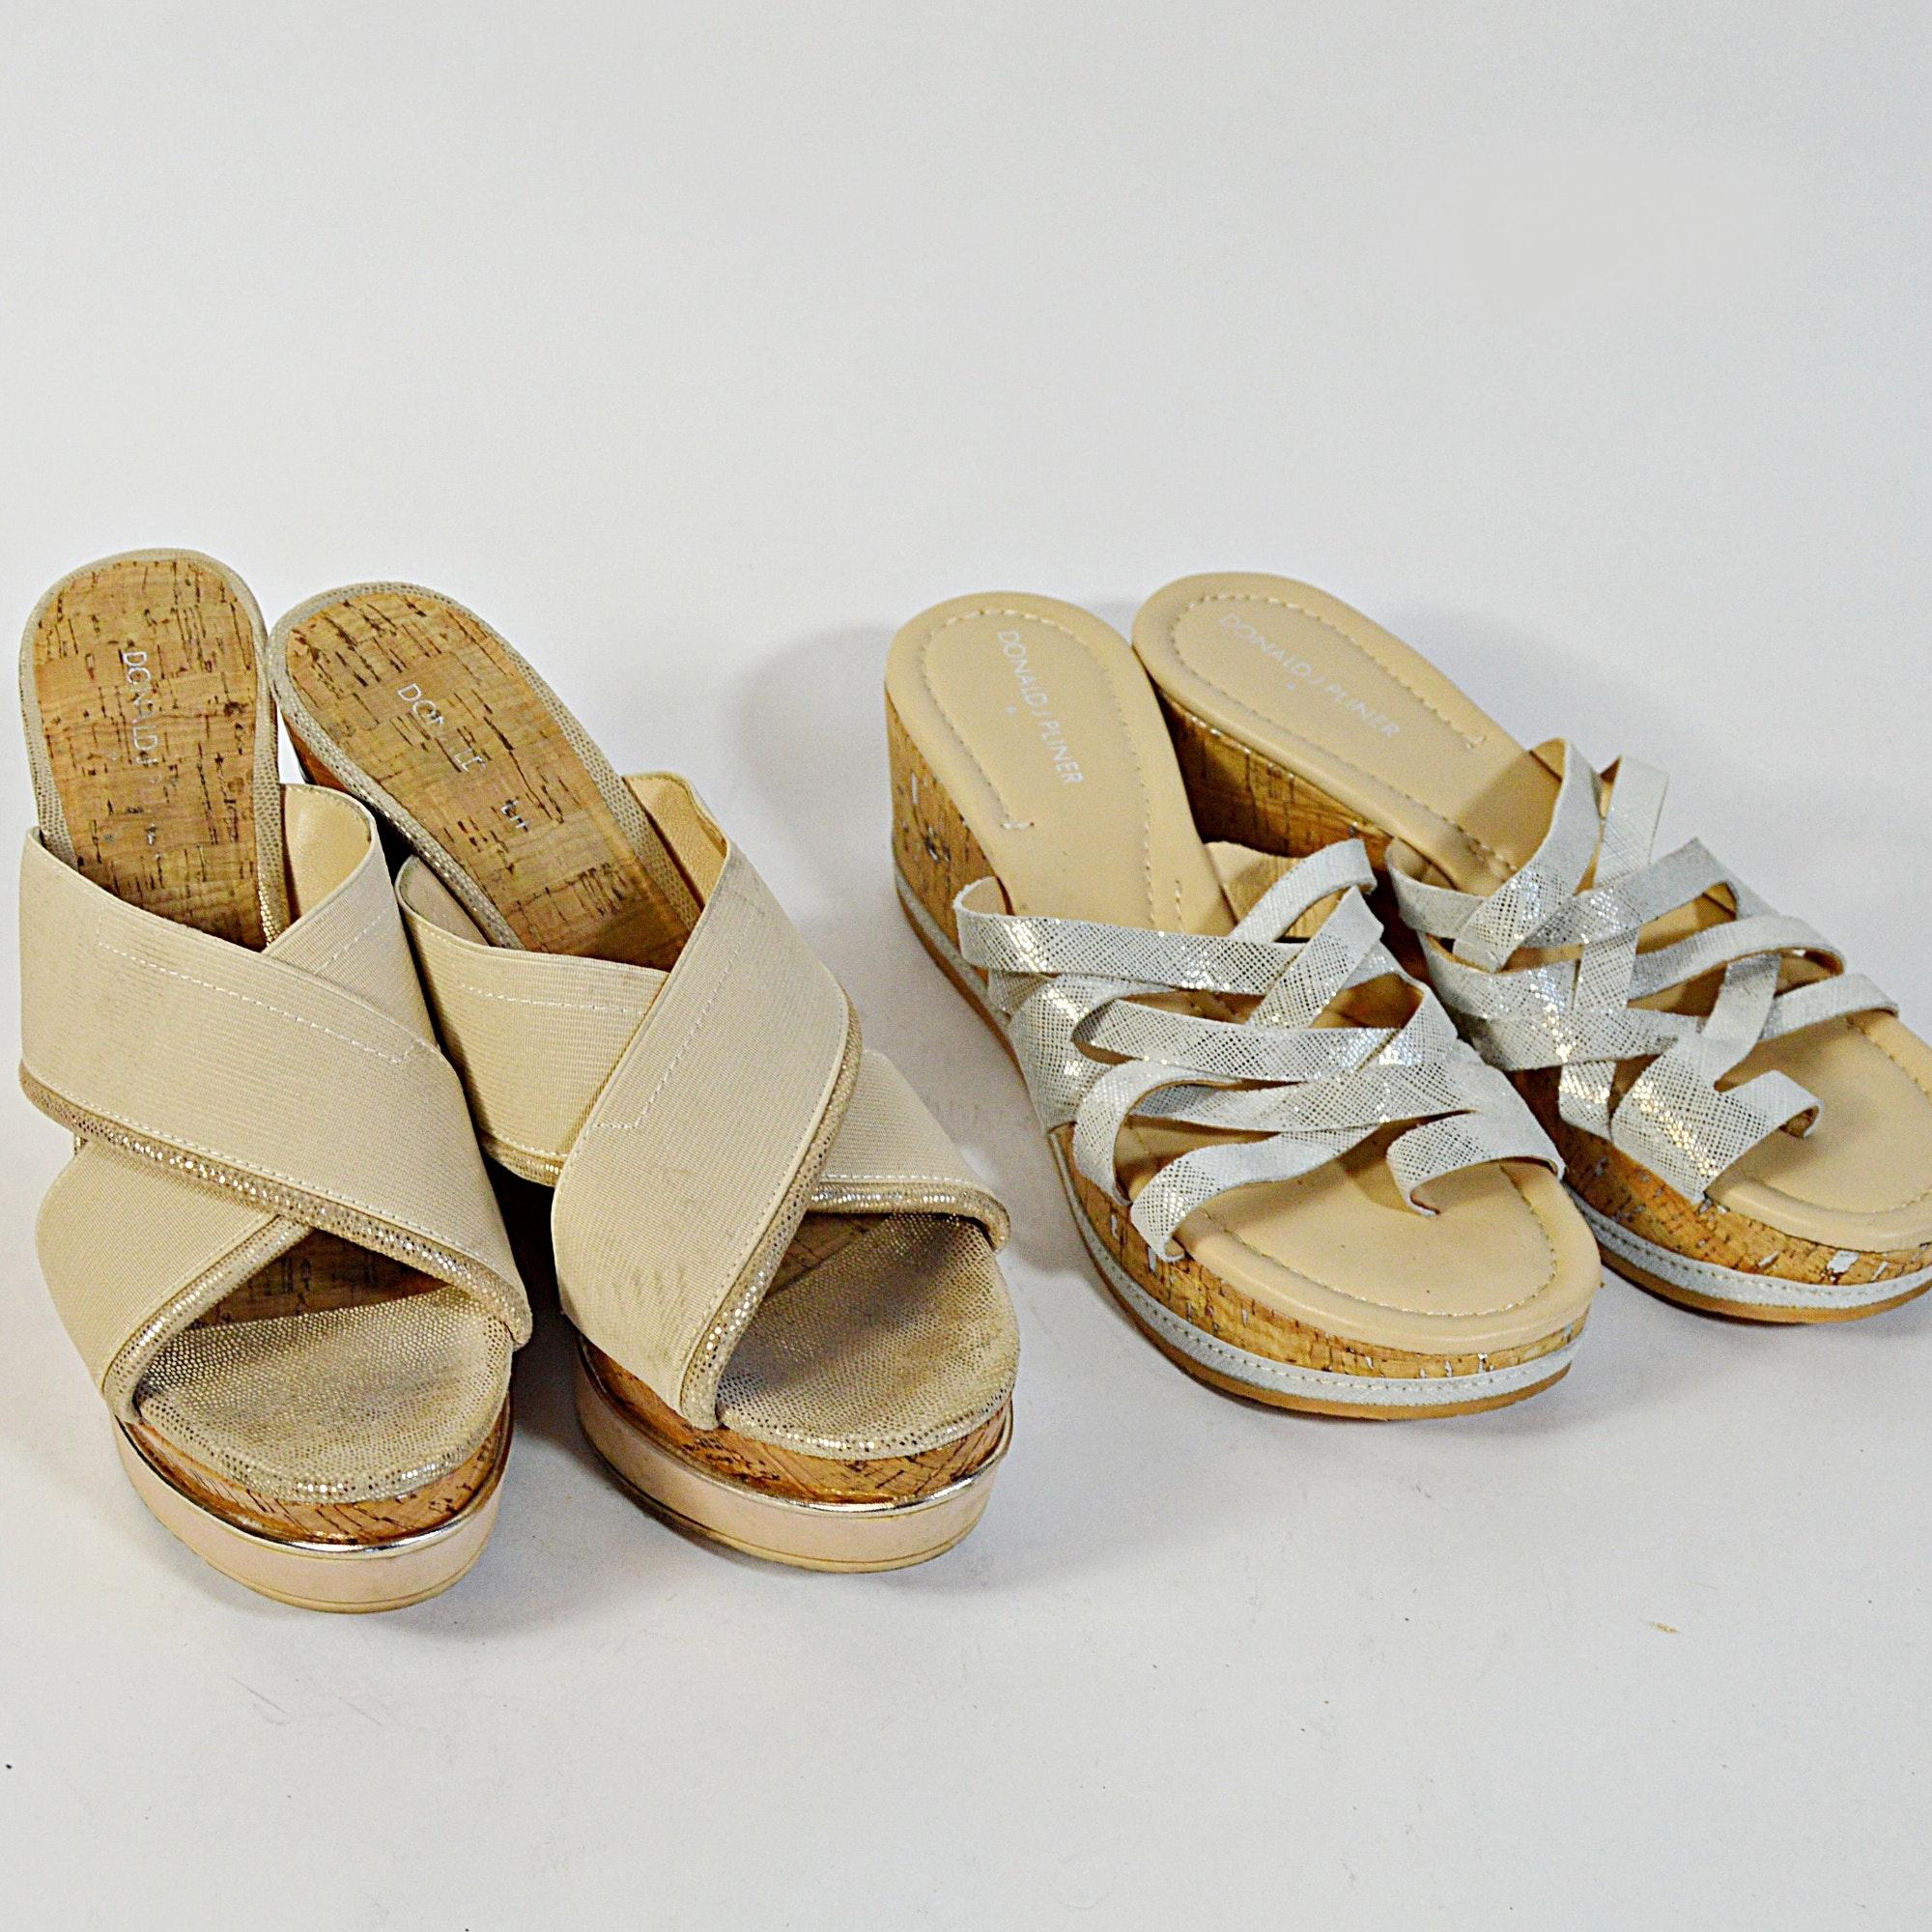 Donald J. Pliner Woven Fabric Peep Toe Wedge Jute Heels, 8.5B